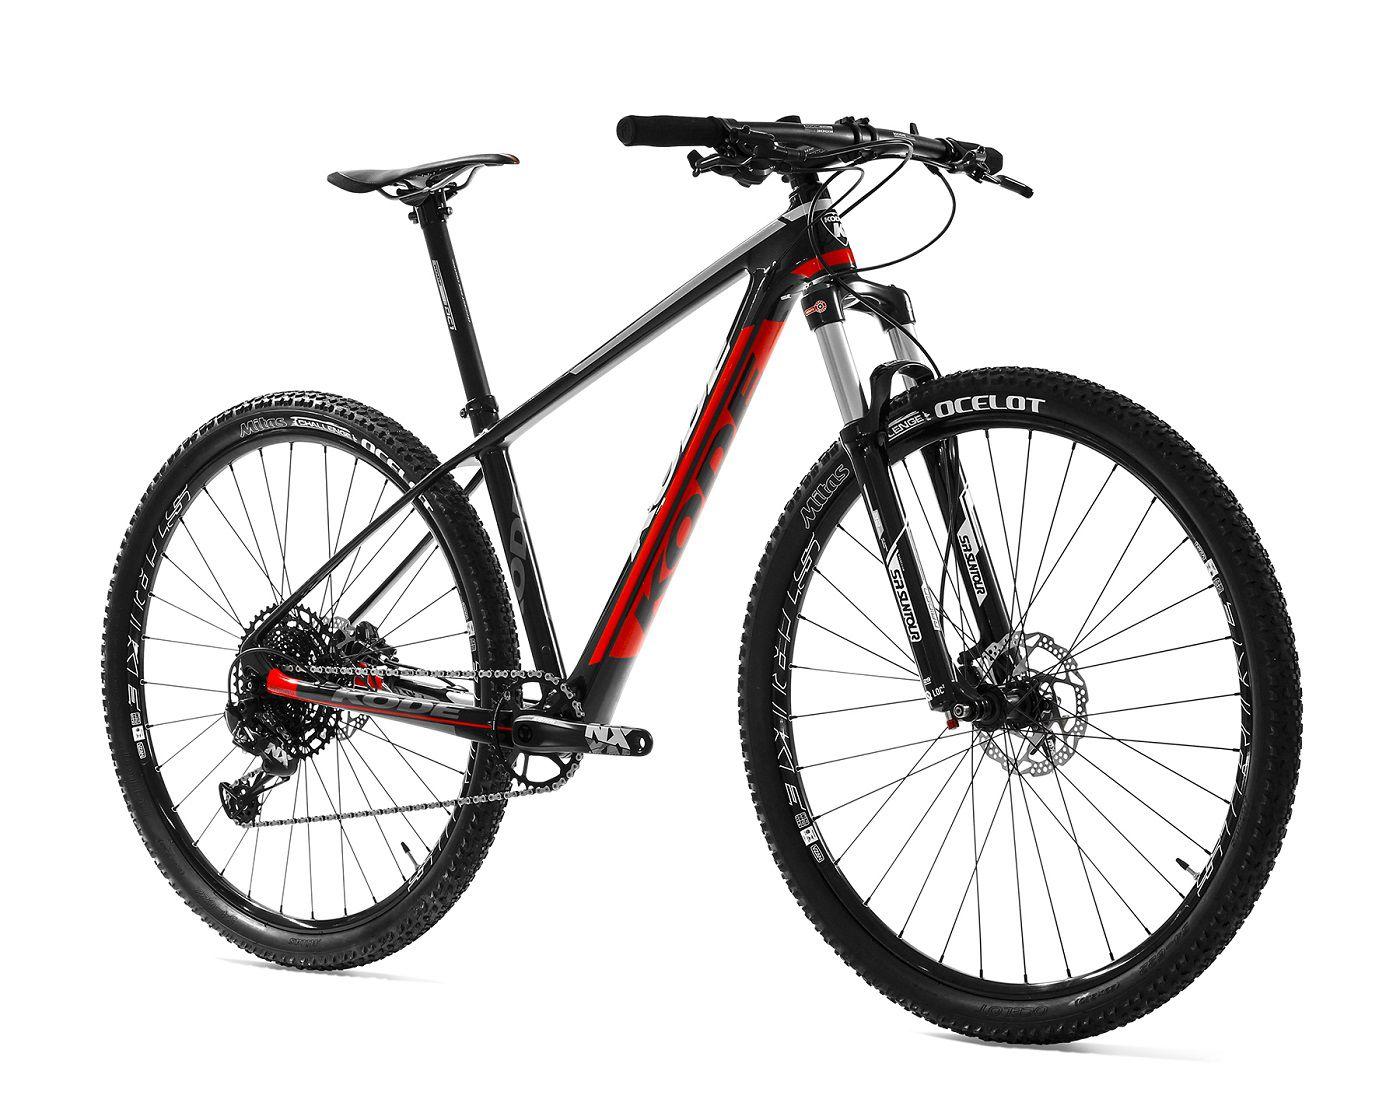 Bicicleta Kode Prodigy Sram Nx Eagle 2019